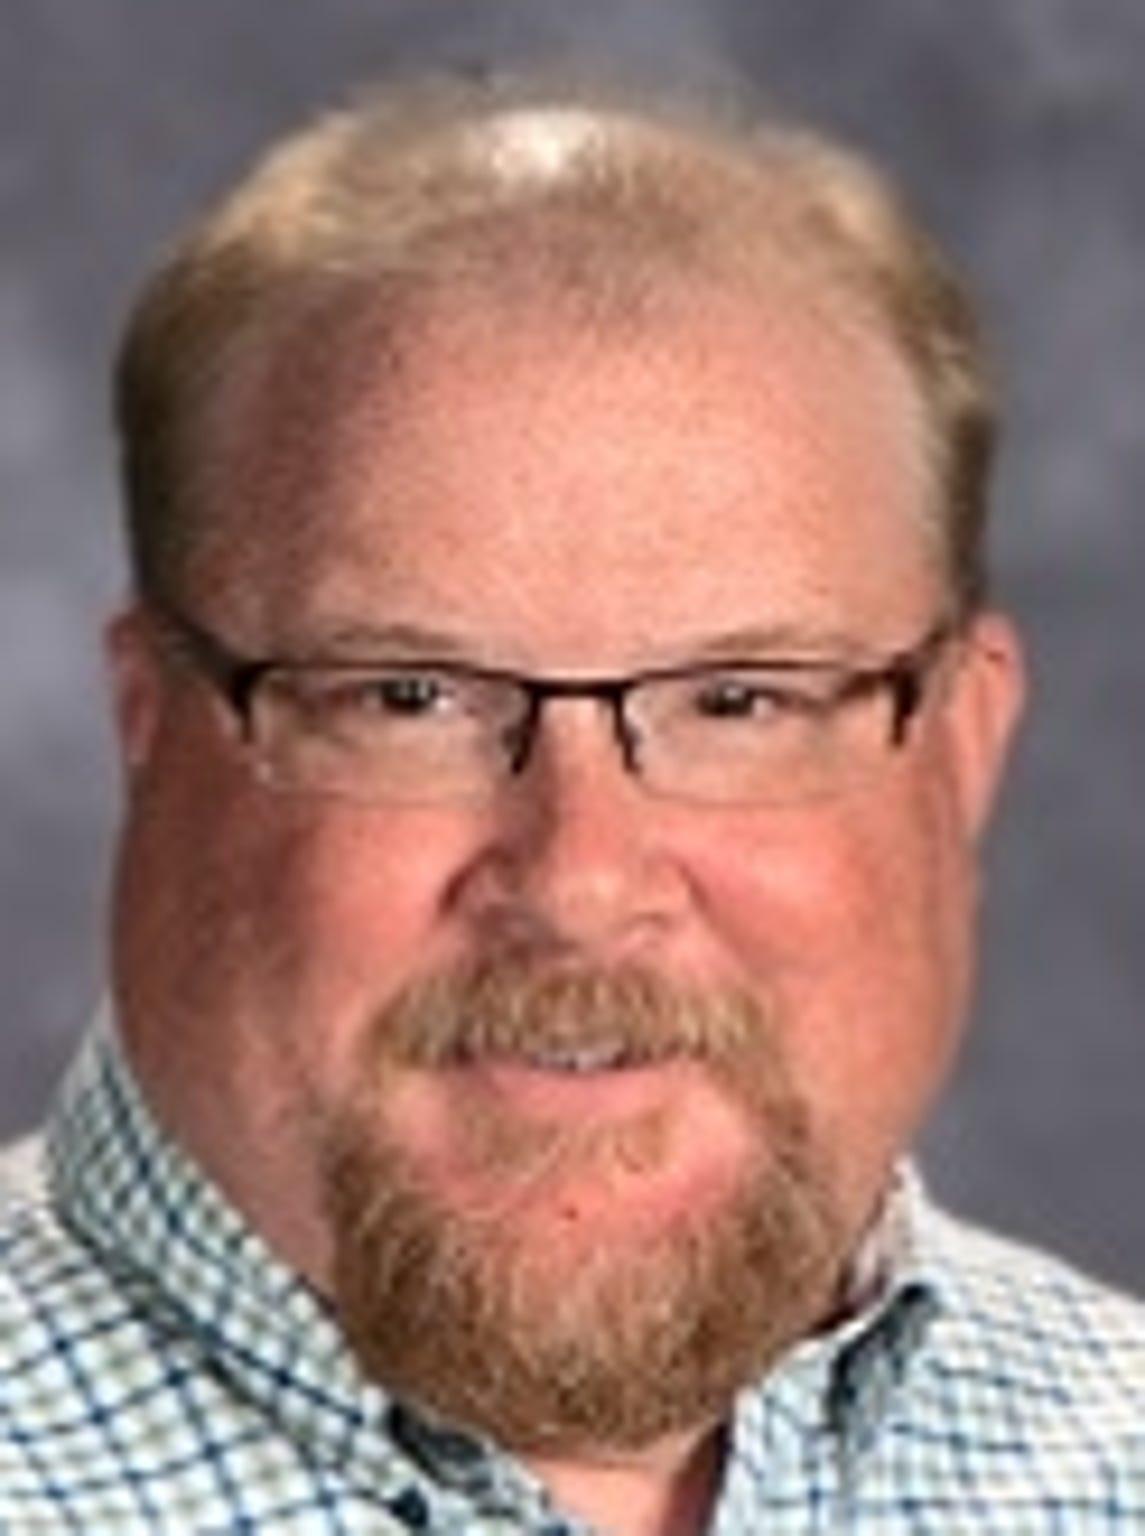 Chris Erickson, president of St. Cloud Education Association